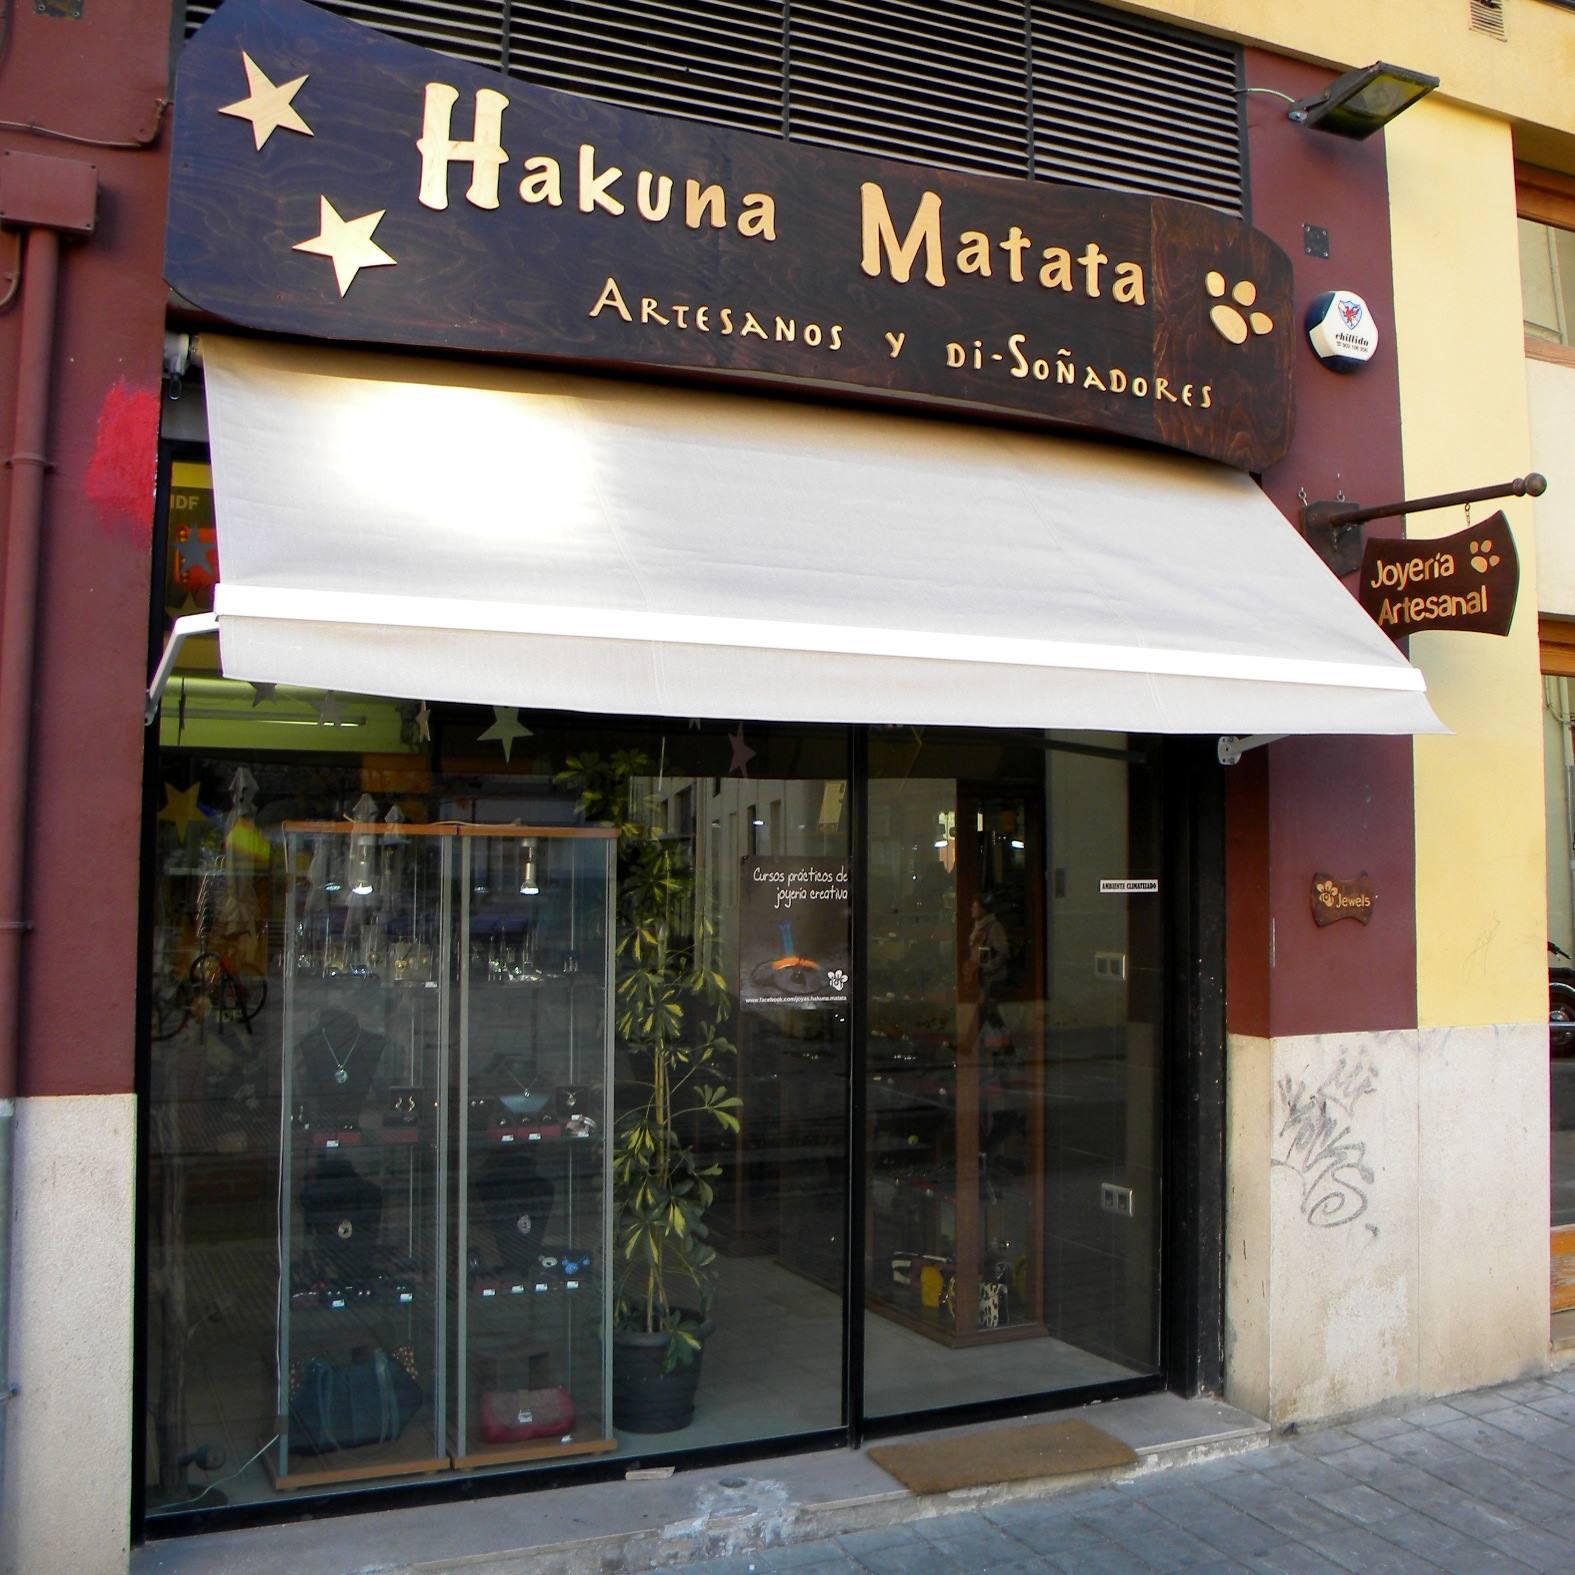 Valencia medieval joyeros artesanos en valencia hakuna matata - Artesanos valencia ...